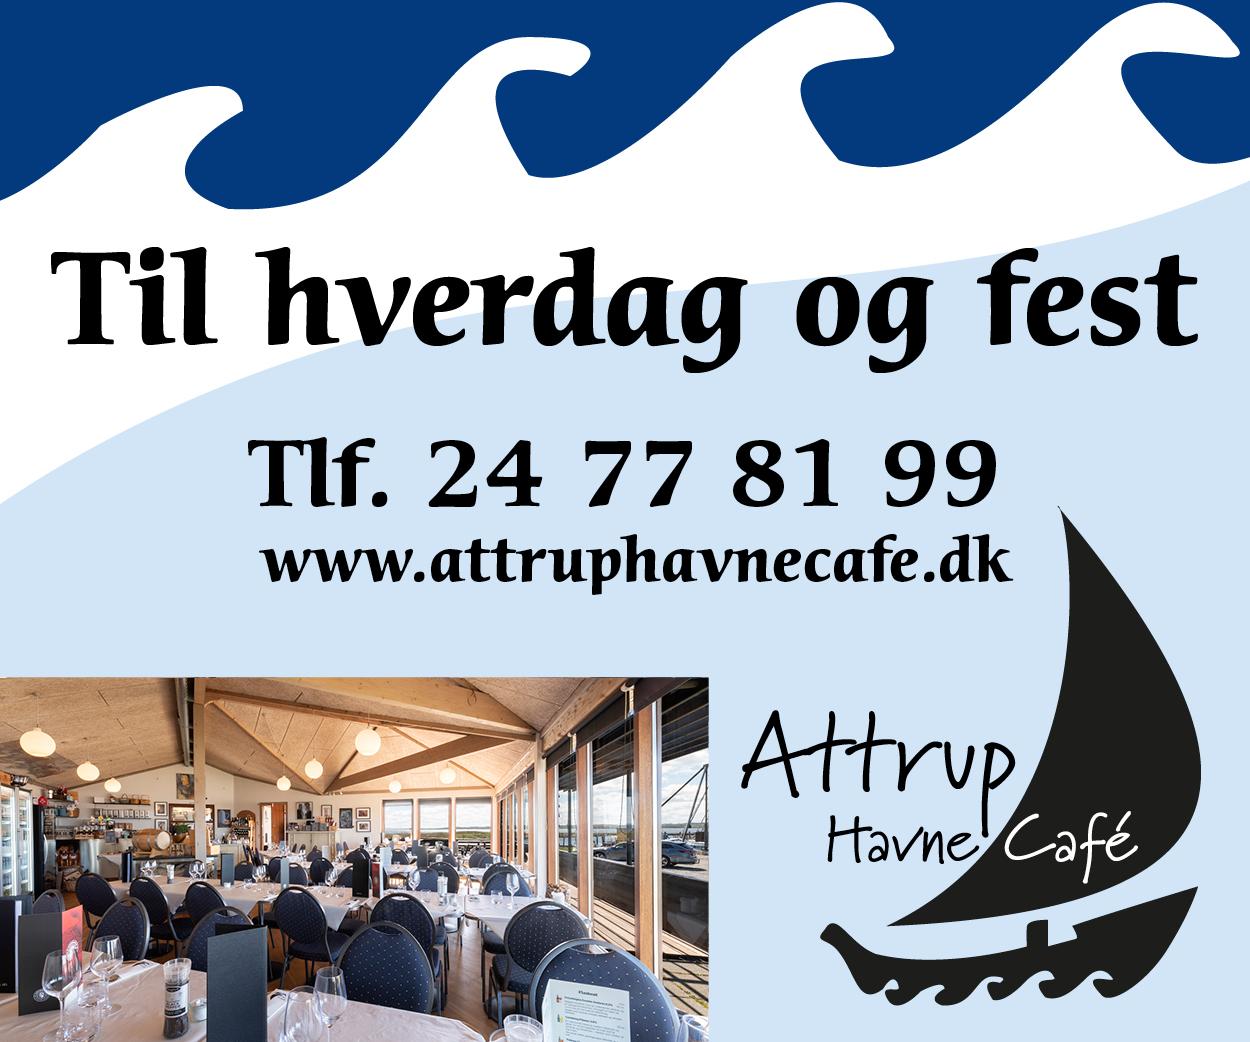 Attrup Havne Café 2